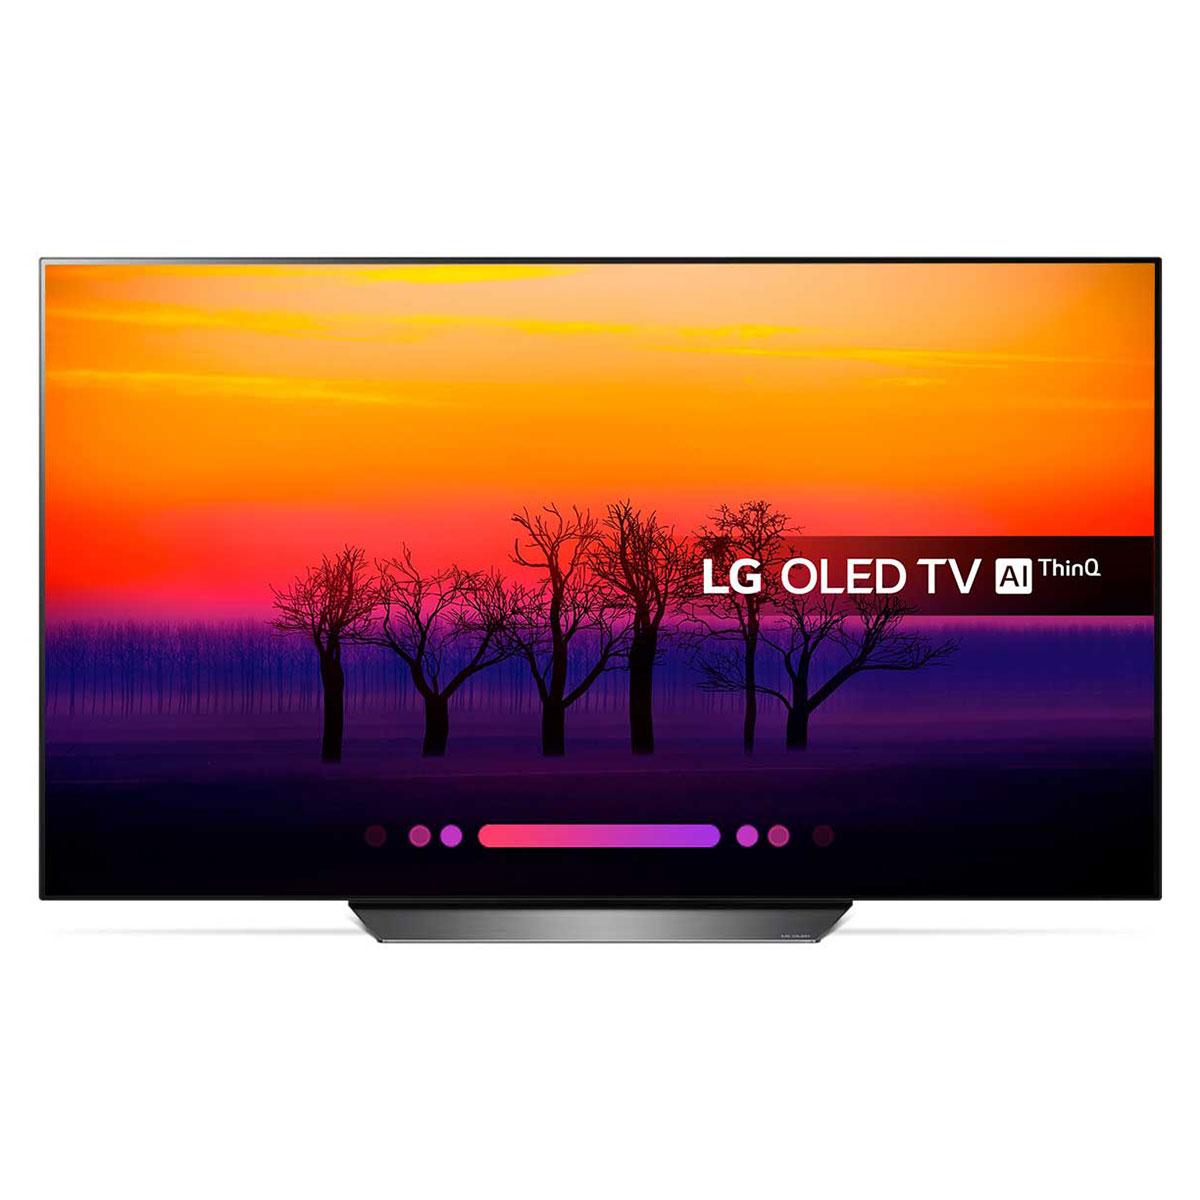 "TV LG OLED65B8 Téléviseur OLED 4K 65"" (165 cm) 16/9 - 3840 x 2160 pixels - Ultra HD 2160p - HDR - Wi-Fi - Bluetooth - Dolby Atmos"